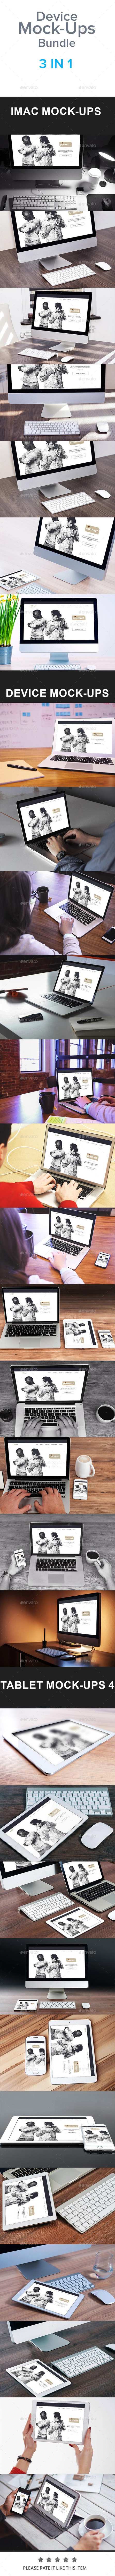 Device Mock-Ups Bundle - Laptop Displays